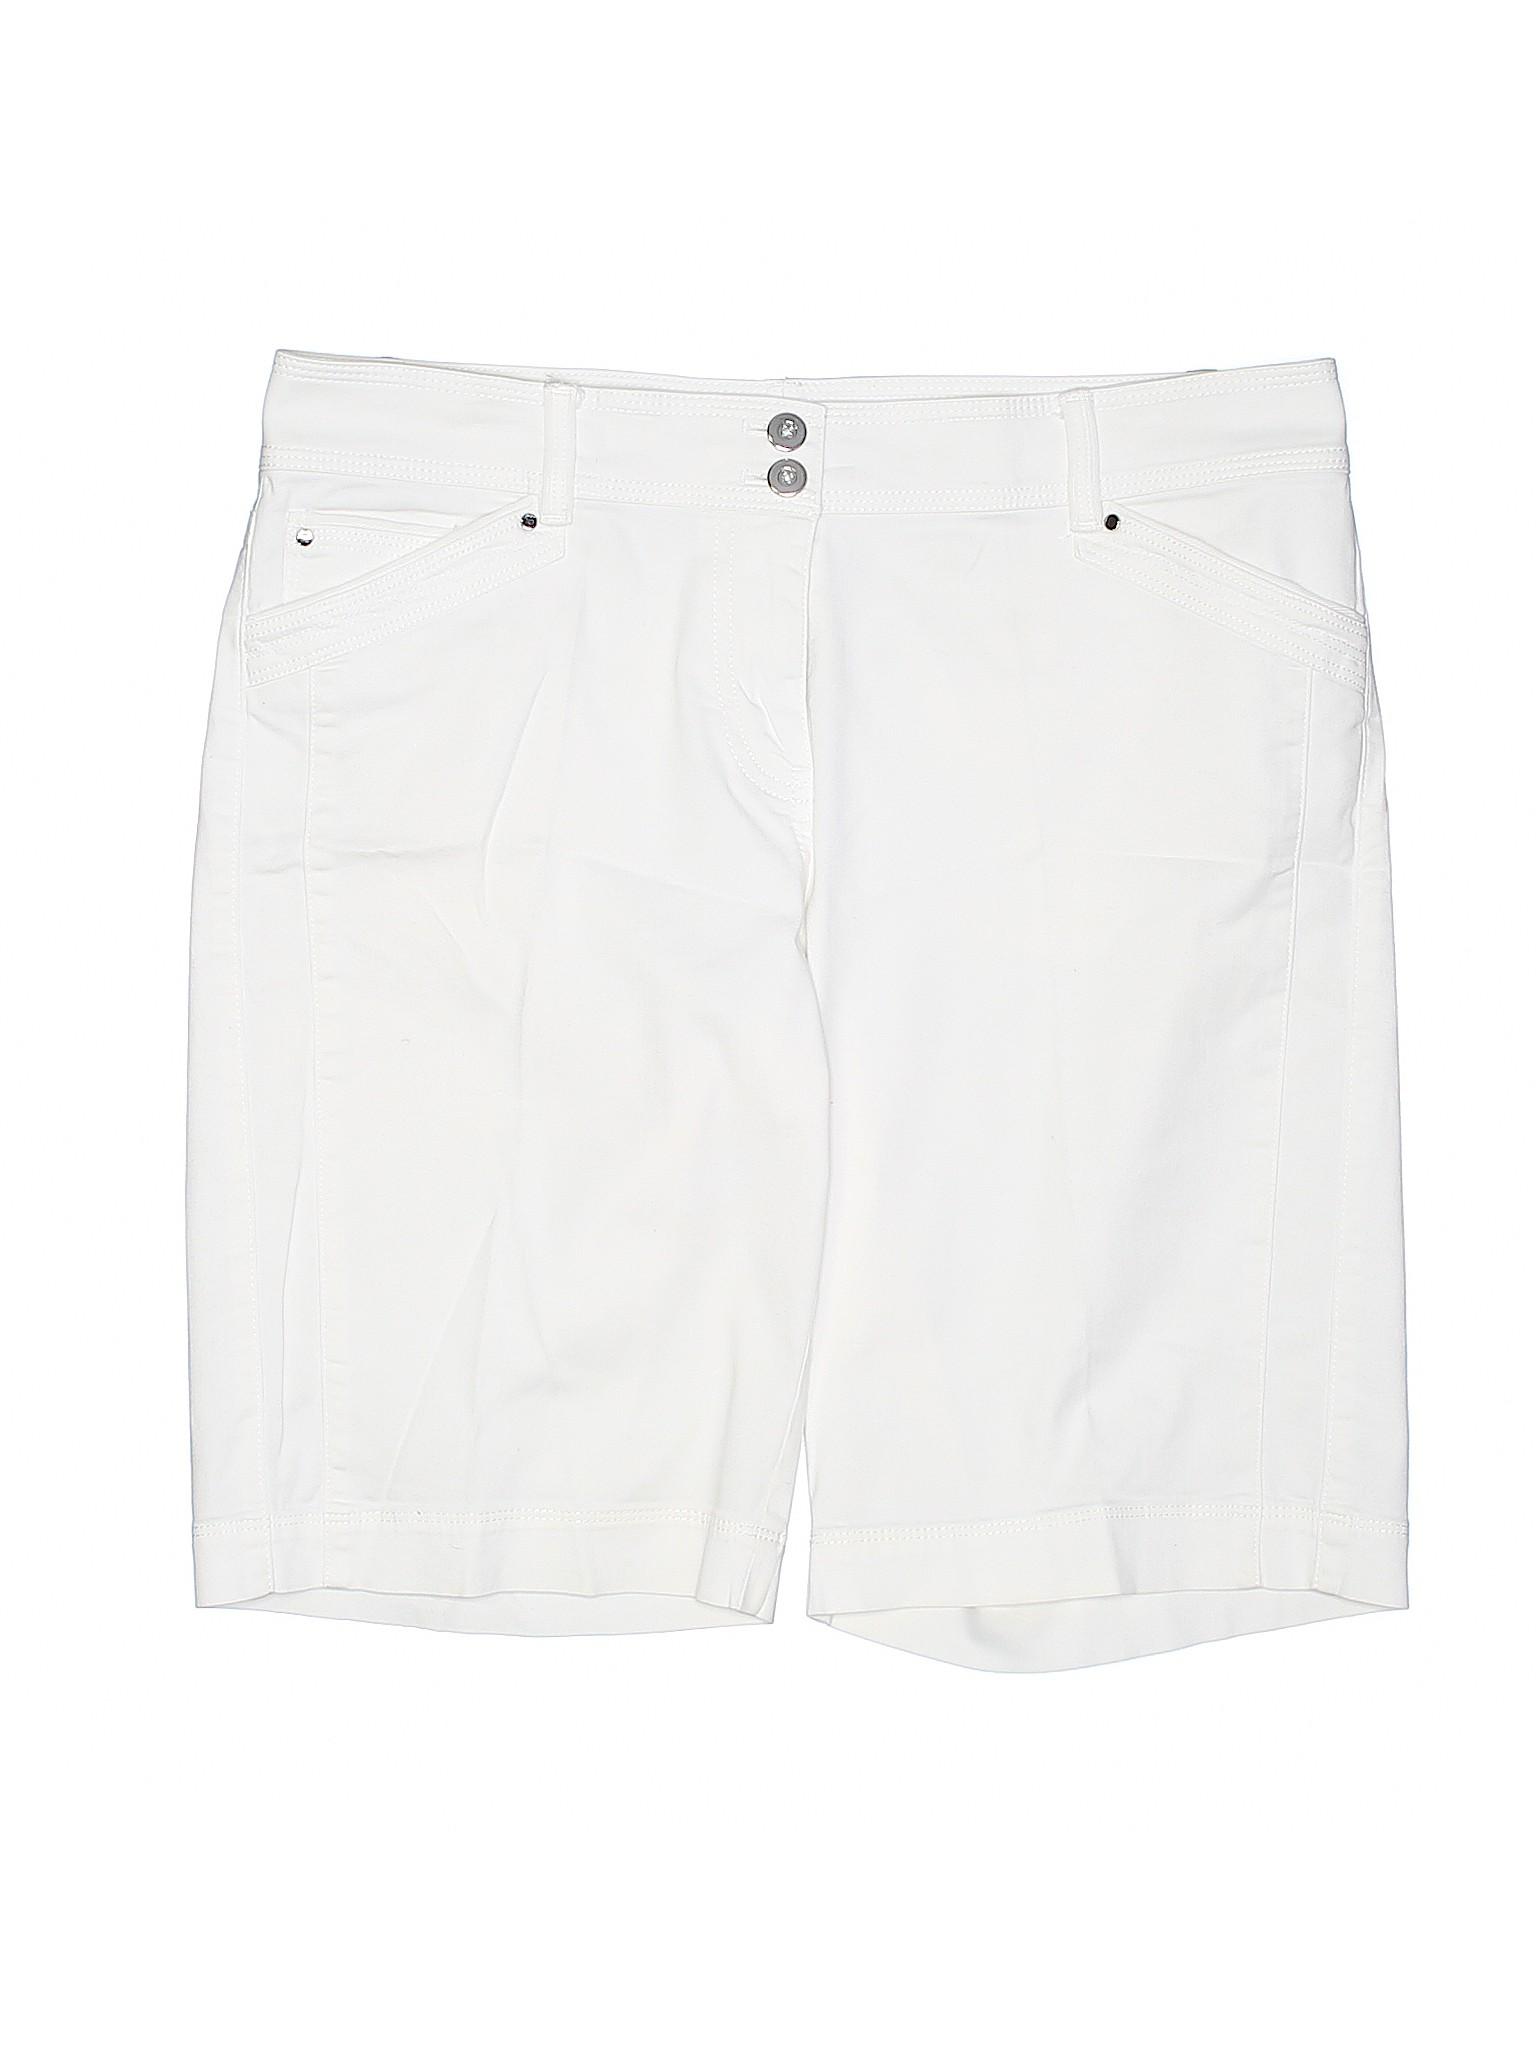 Black White Market leisure Shorts House Boutique qxawfF6xB